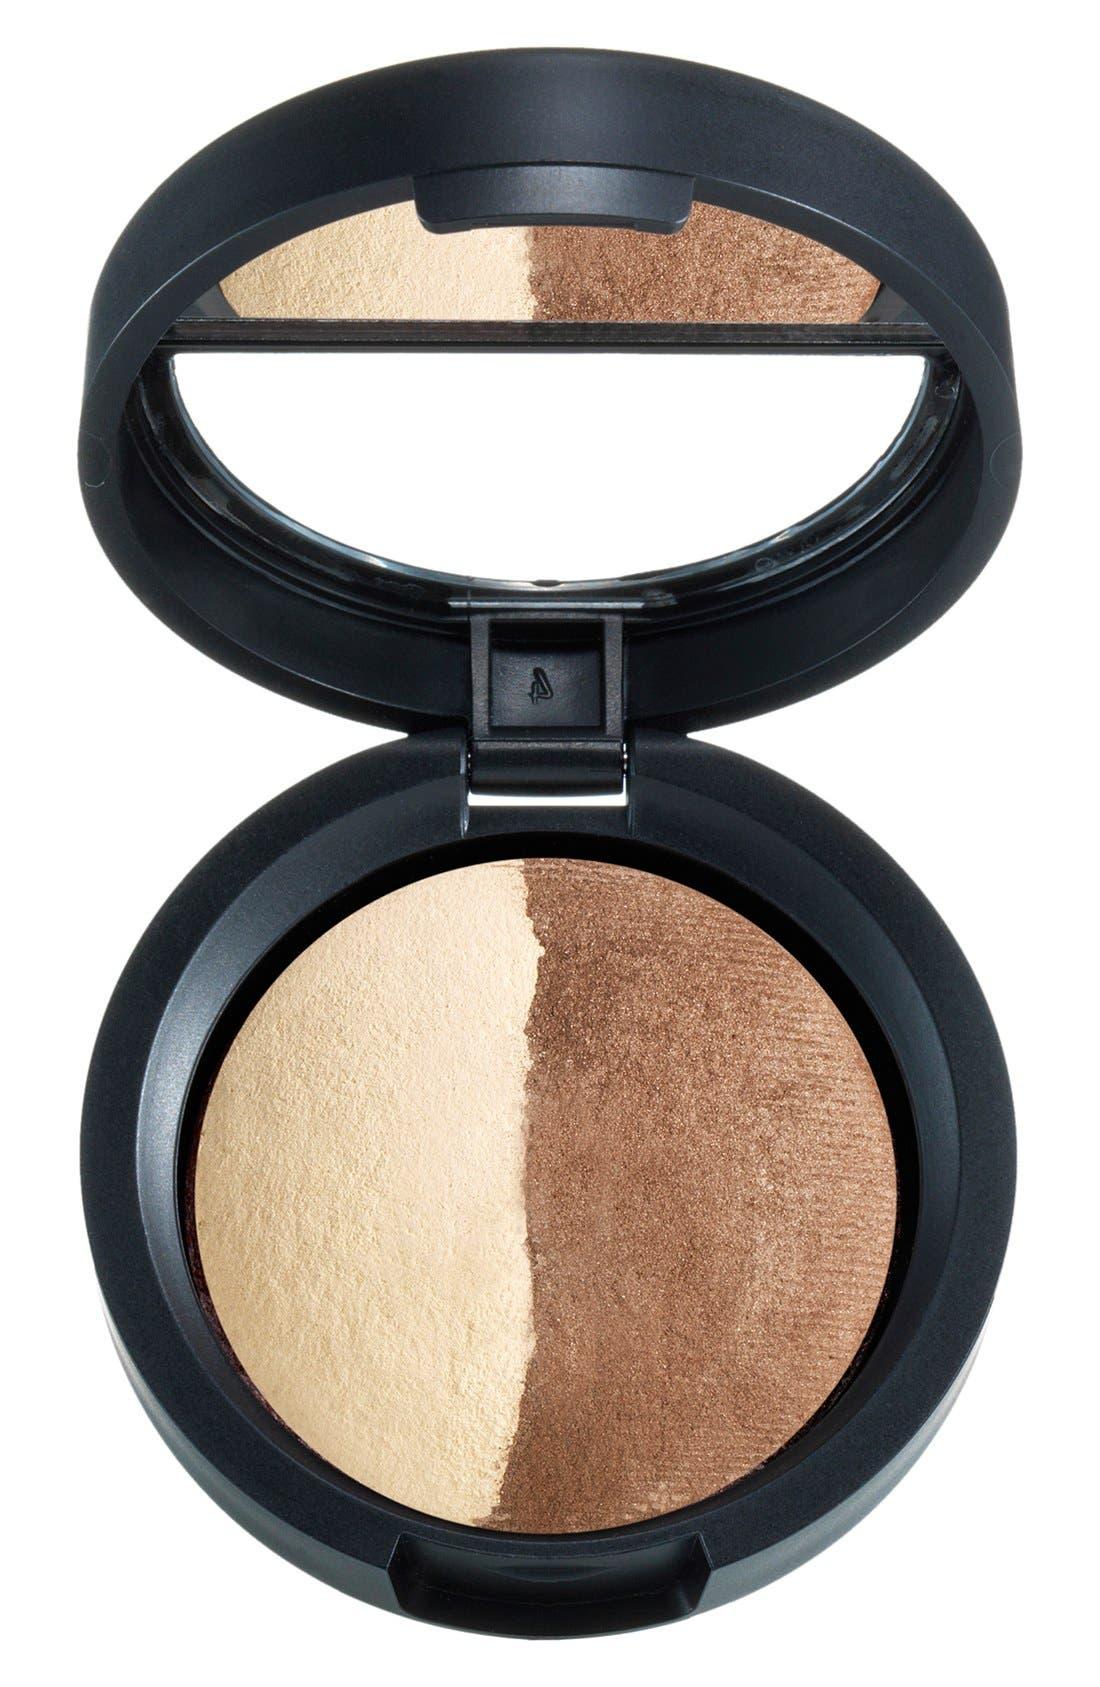 Laura Geller Beauty Baked Color Intense Eyeshadow Duo